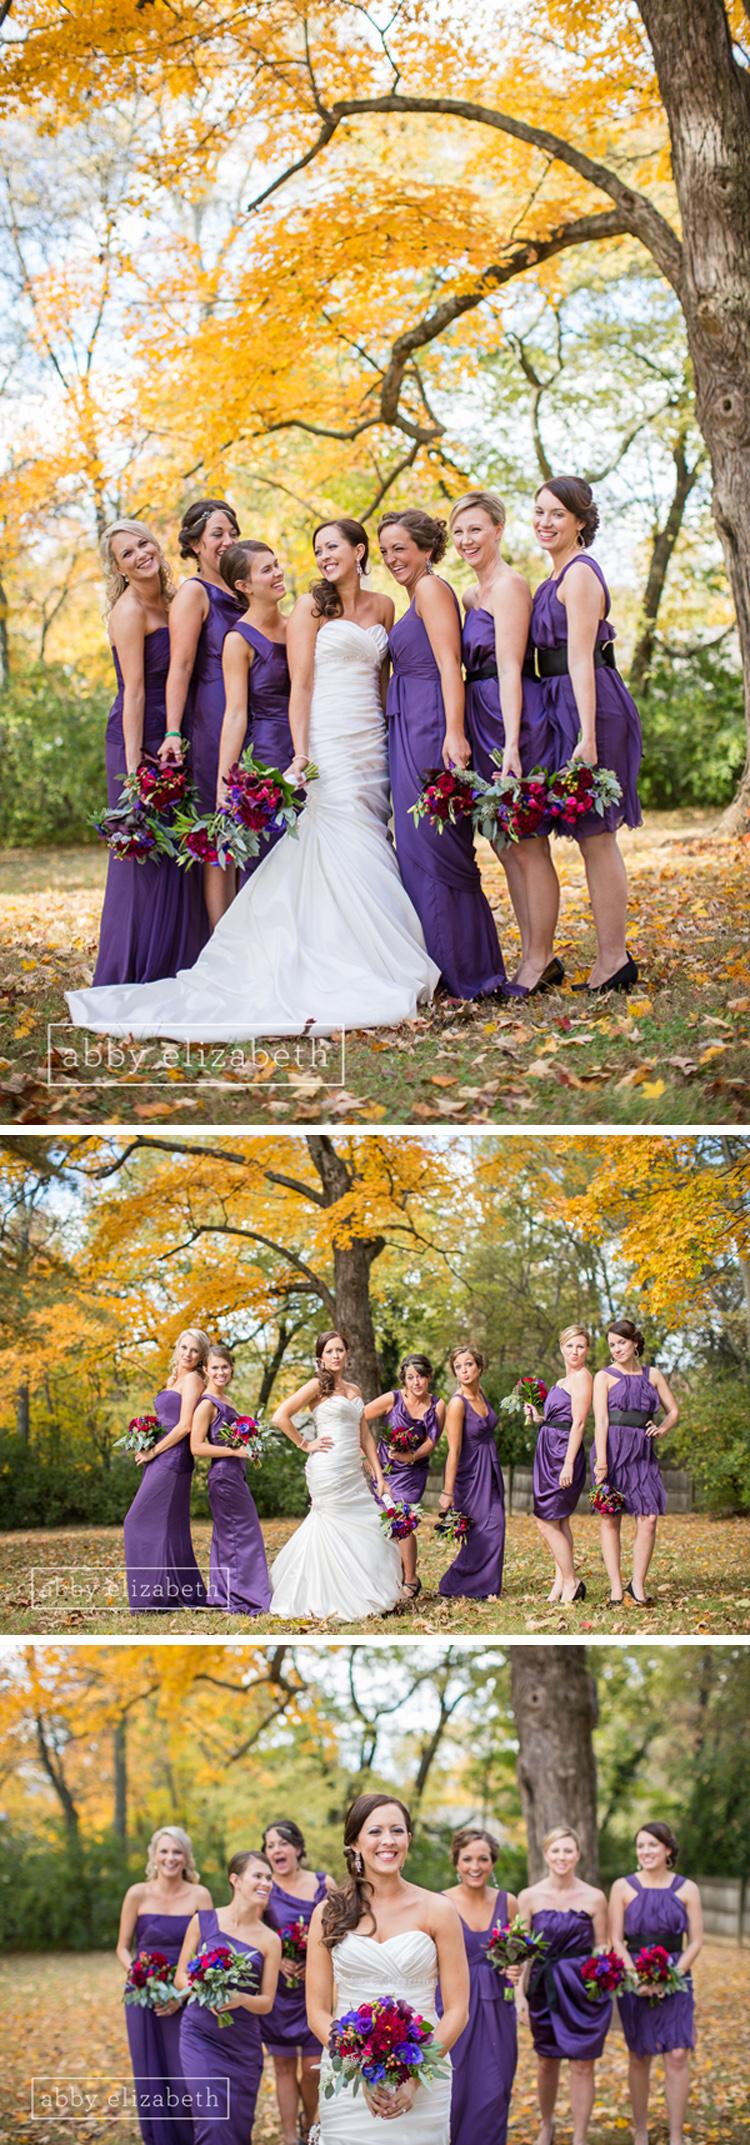 Fall_Wedding_Knoxville_TN_14.jpg